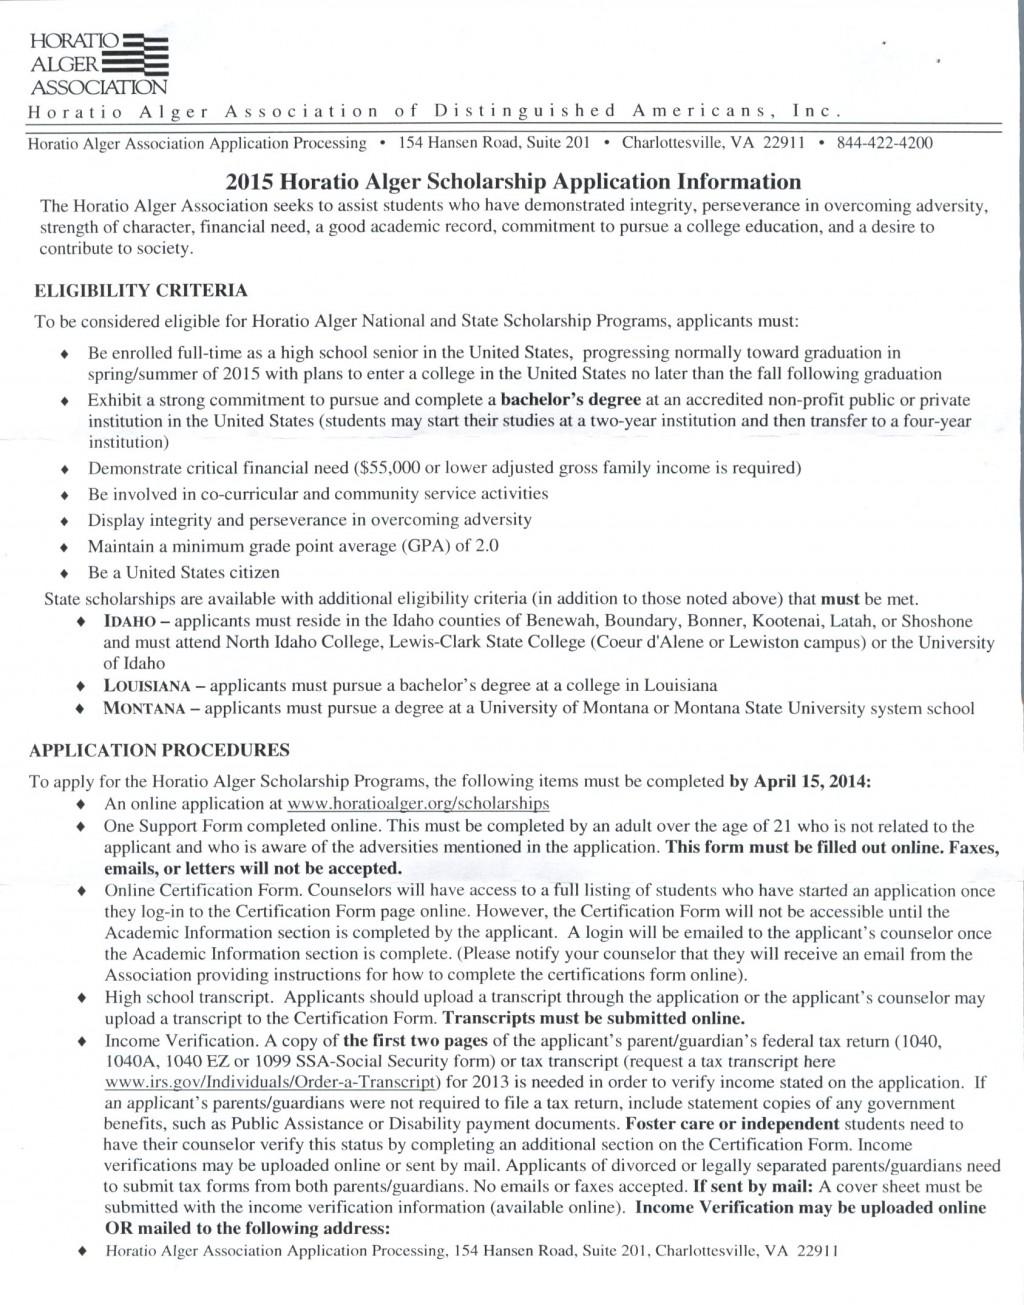 008 Horatio20alger20scholarship Essay Example Questbridge Stirring Essays Examples Finalist National College Match Prompts Large